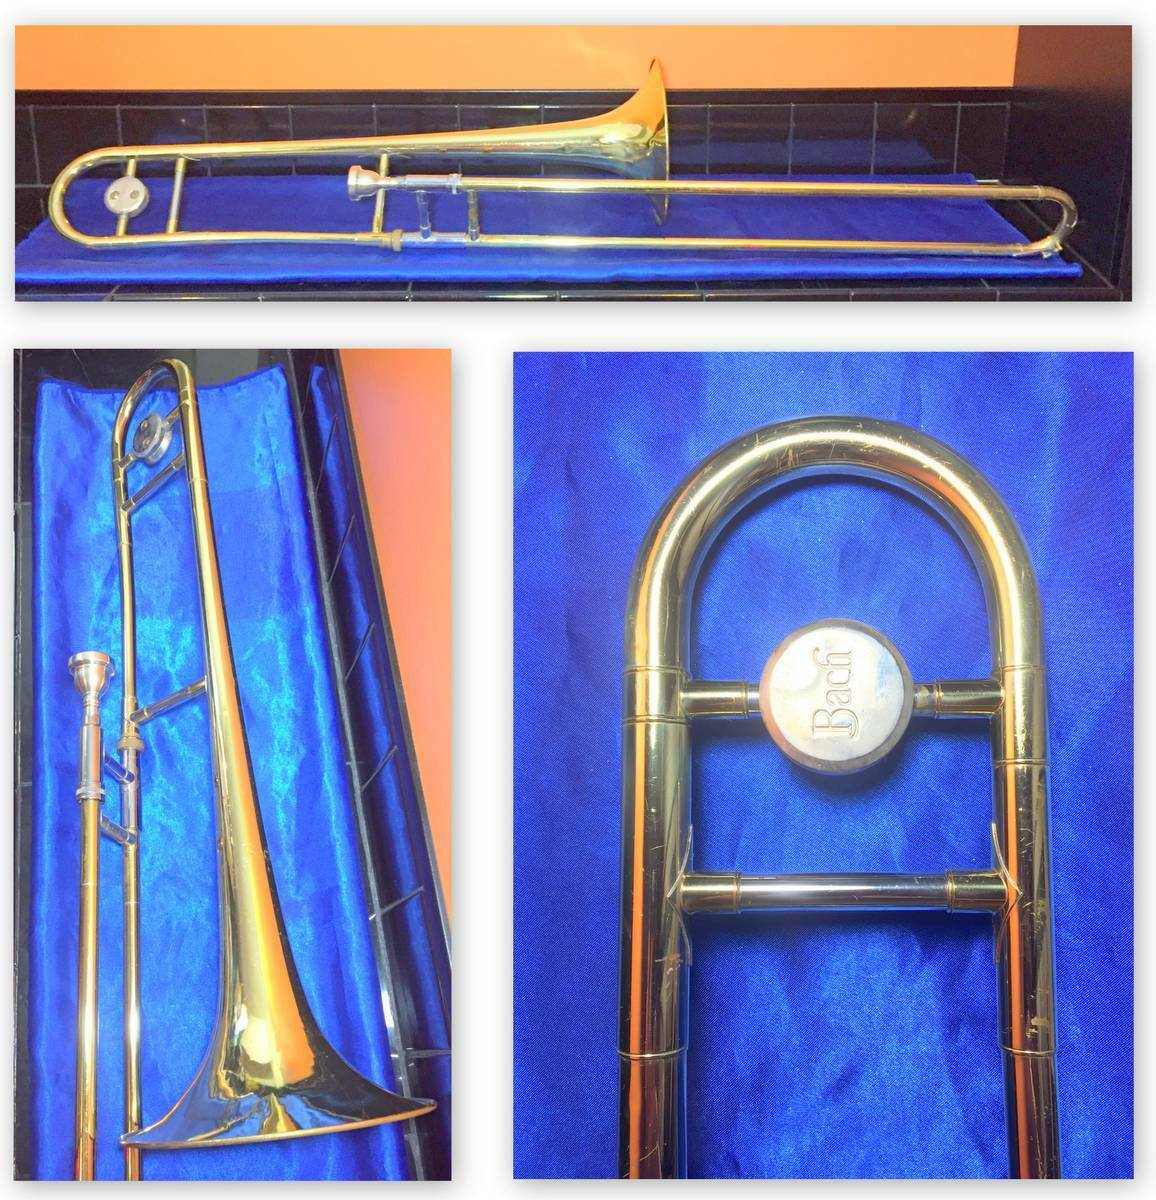 Bach USA Student Trombone GREAT PLAYER Case & Mundstück Fully Serviced